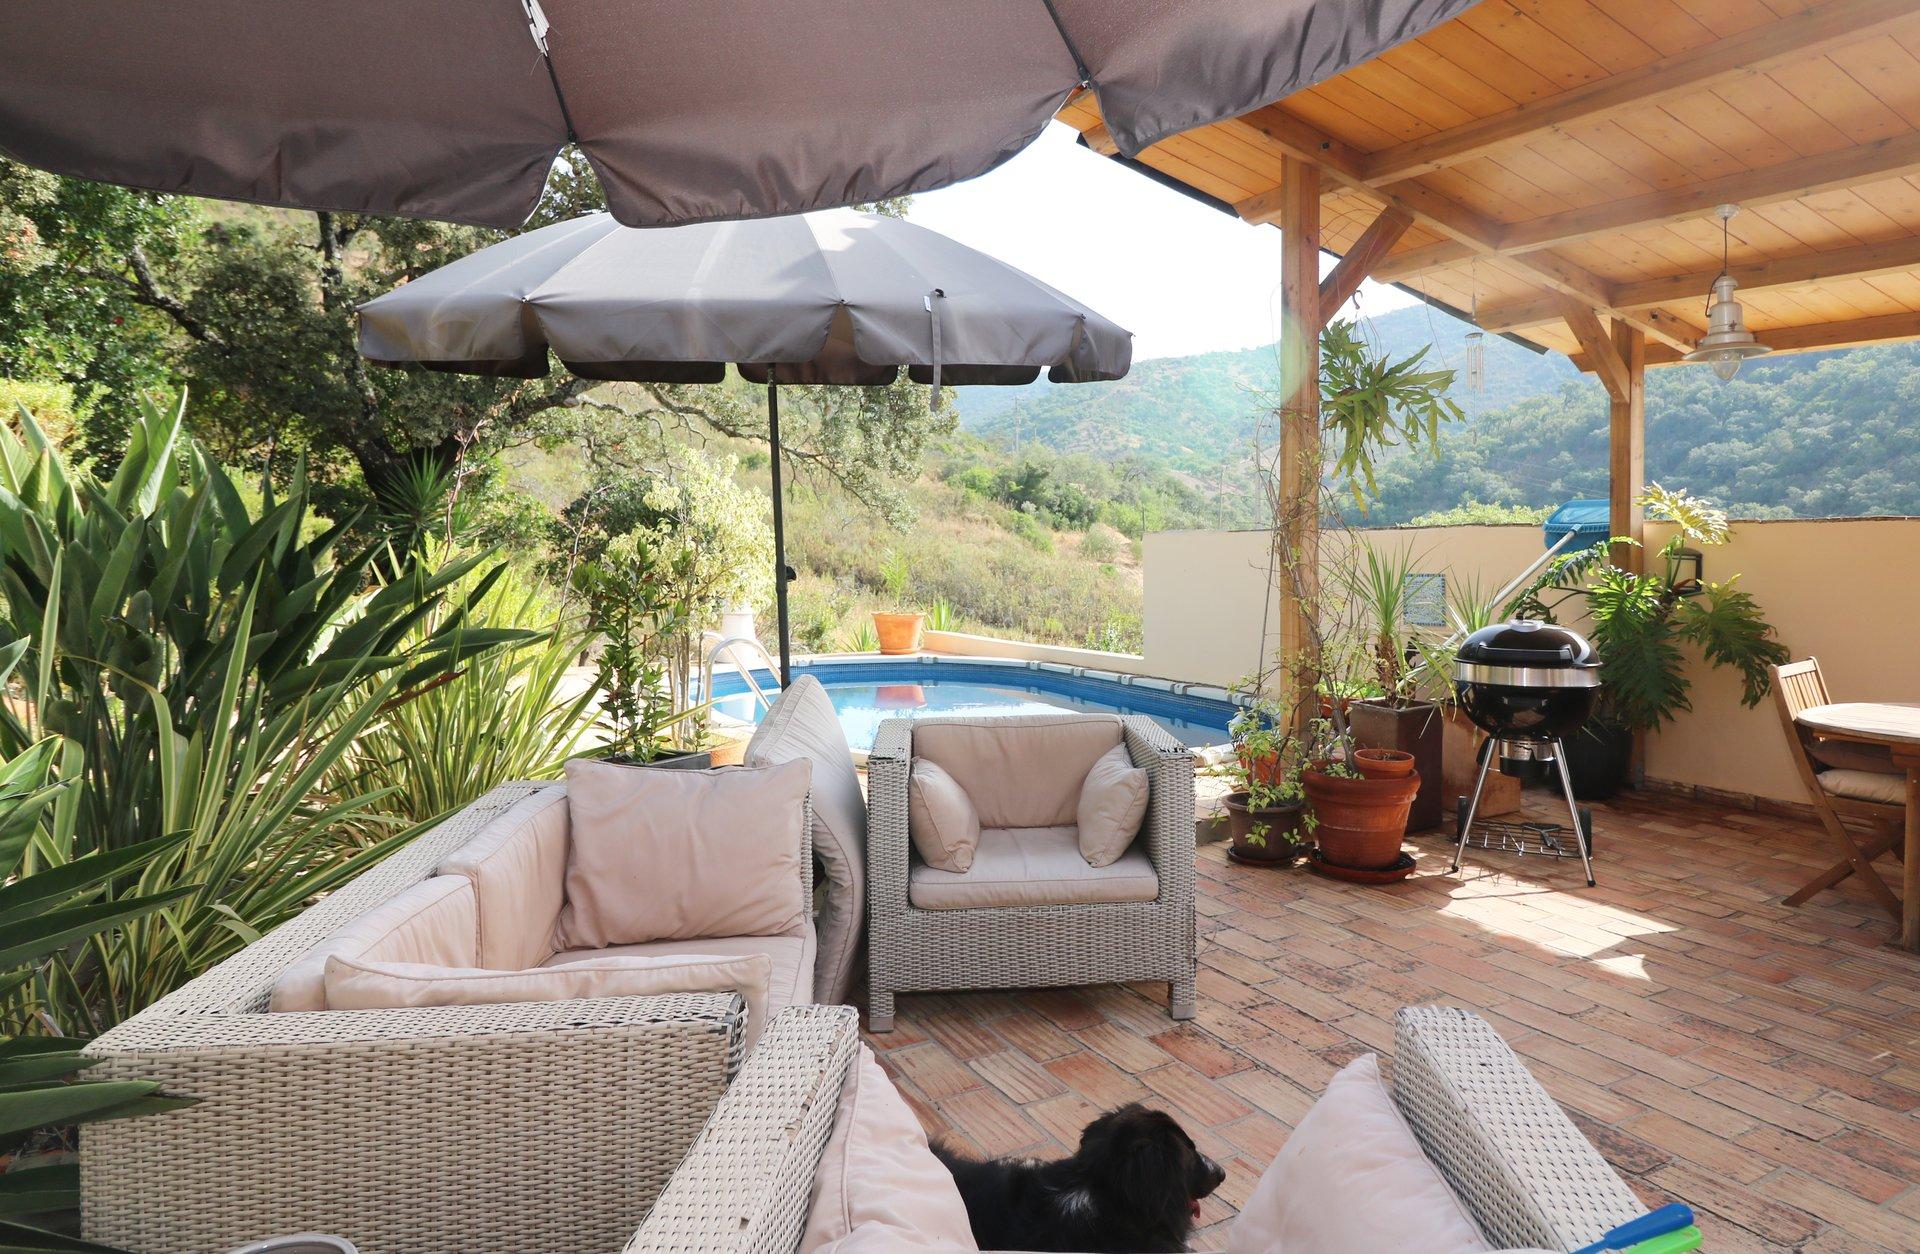 3 Bedroom Villa Salir, Central Algarve Ref: JV10458